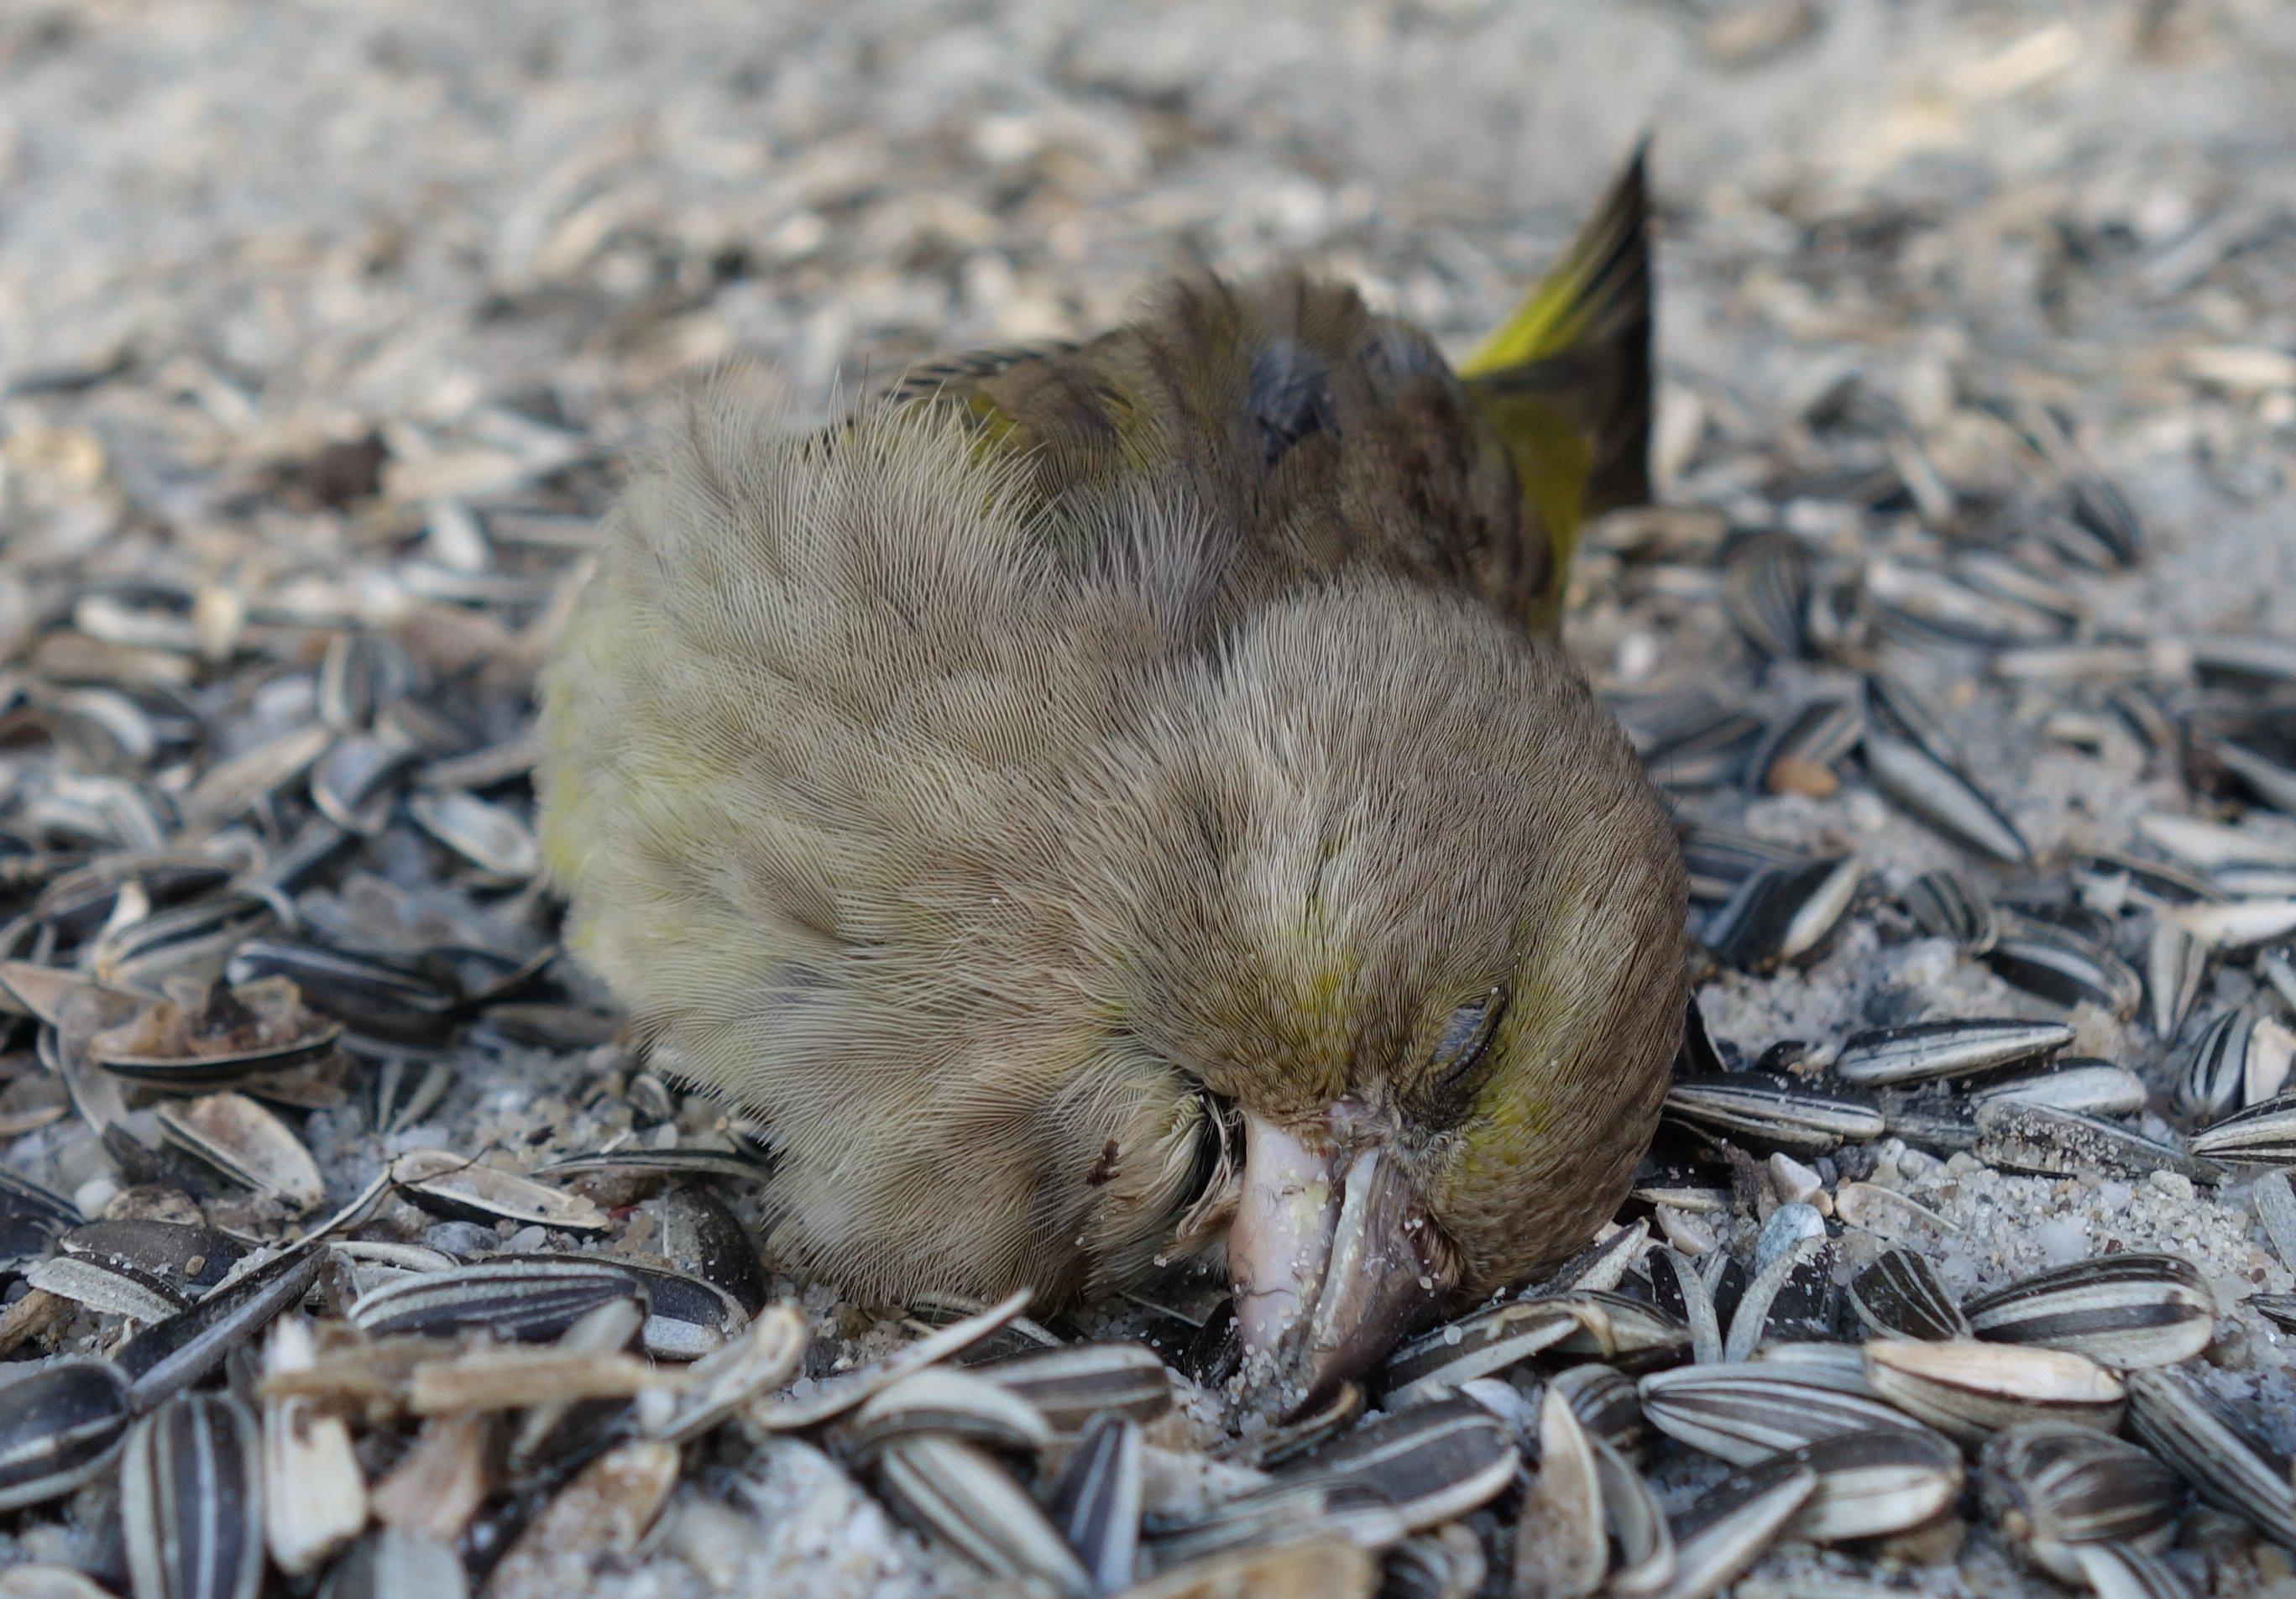 Toter Grünfink unter dem Vogelhaus